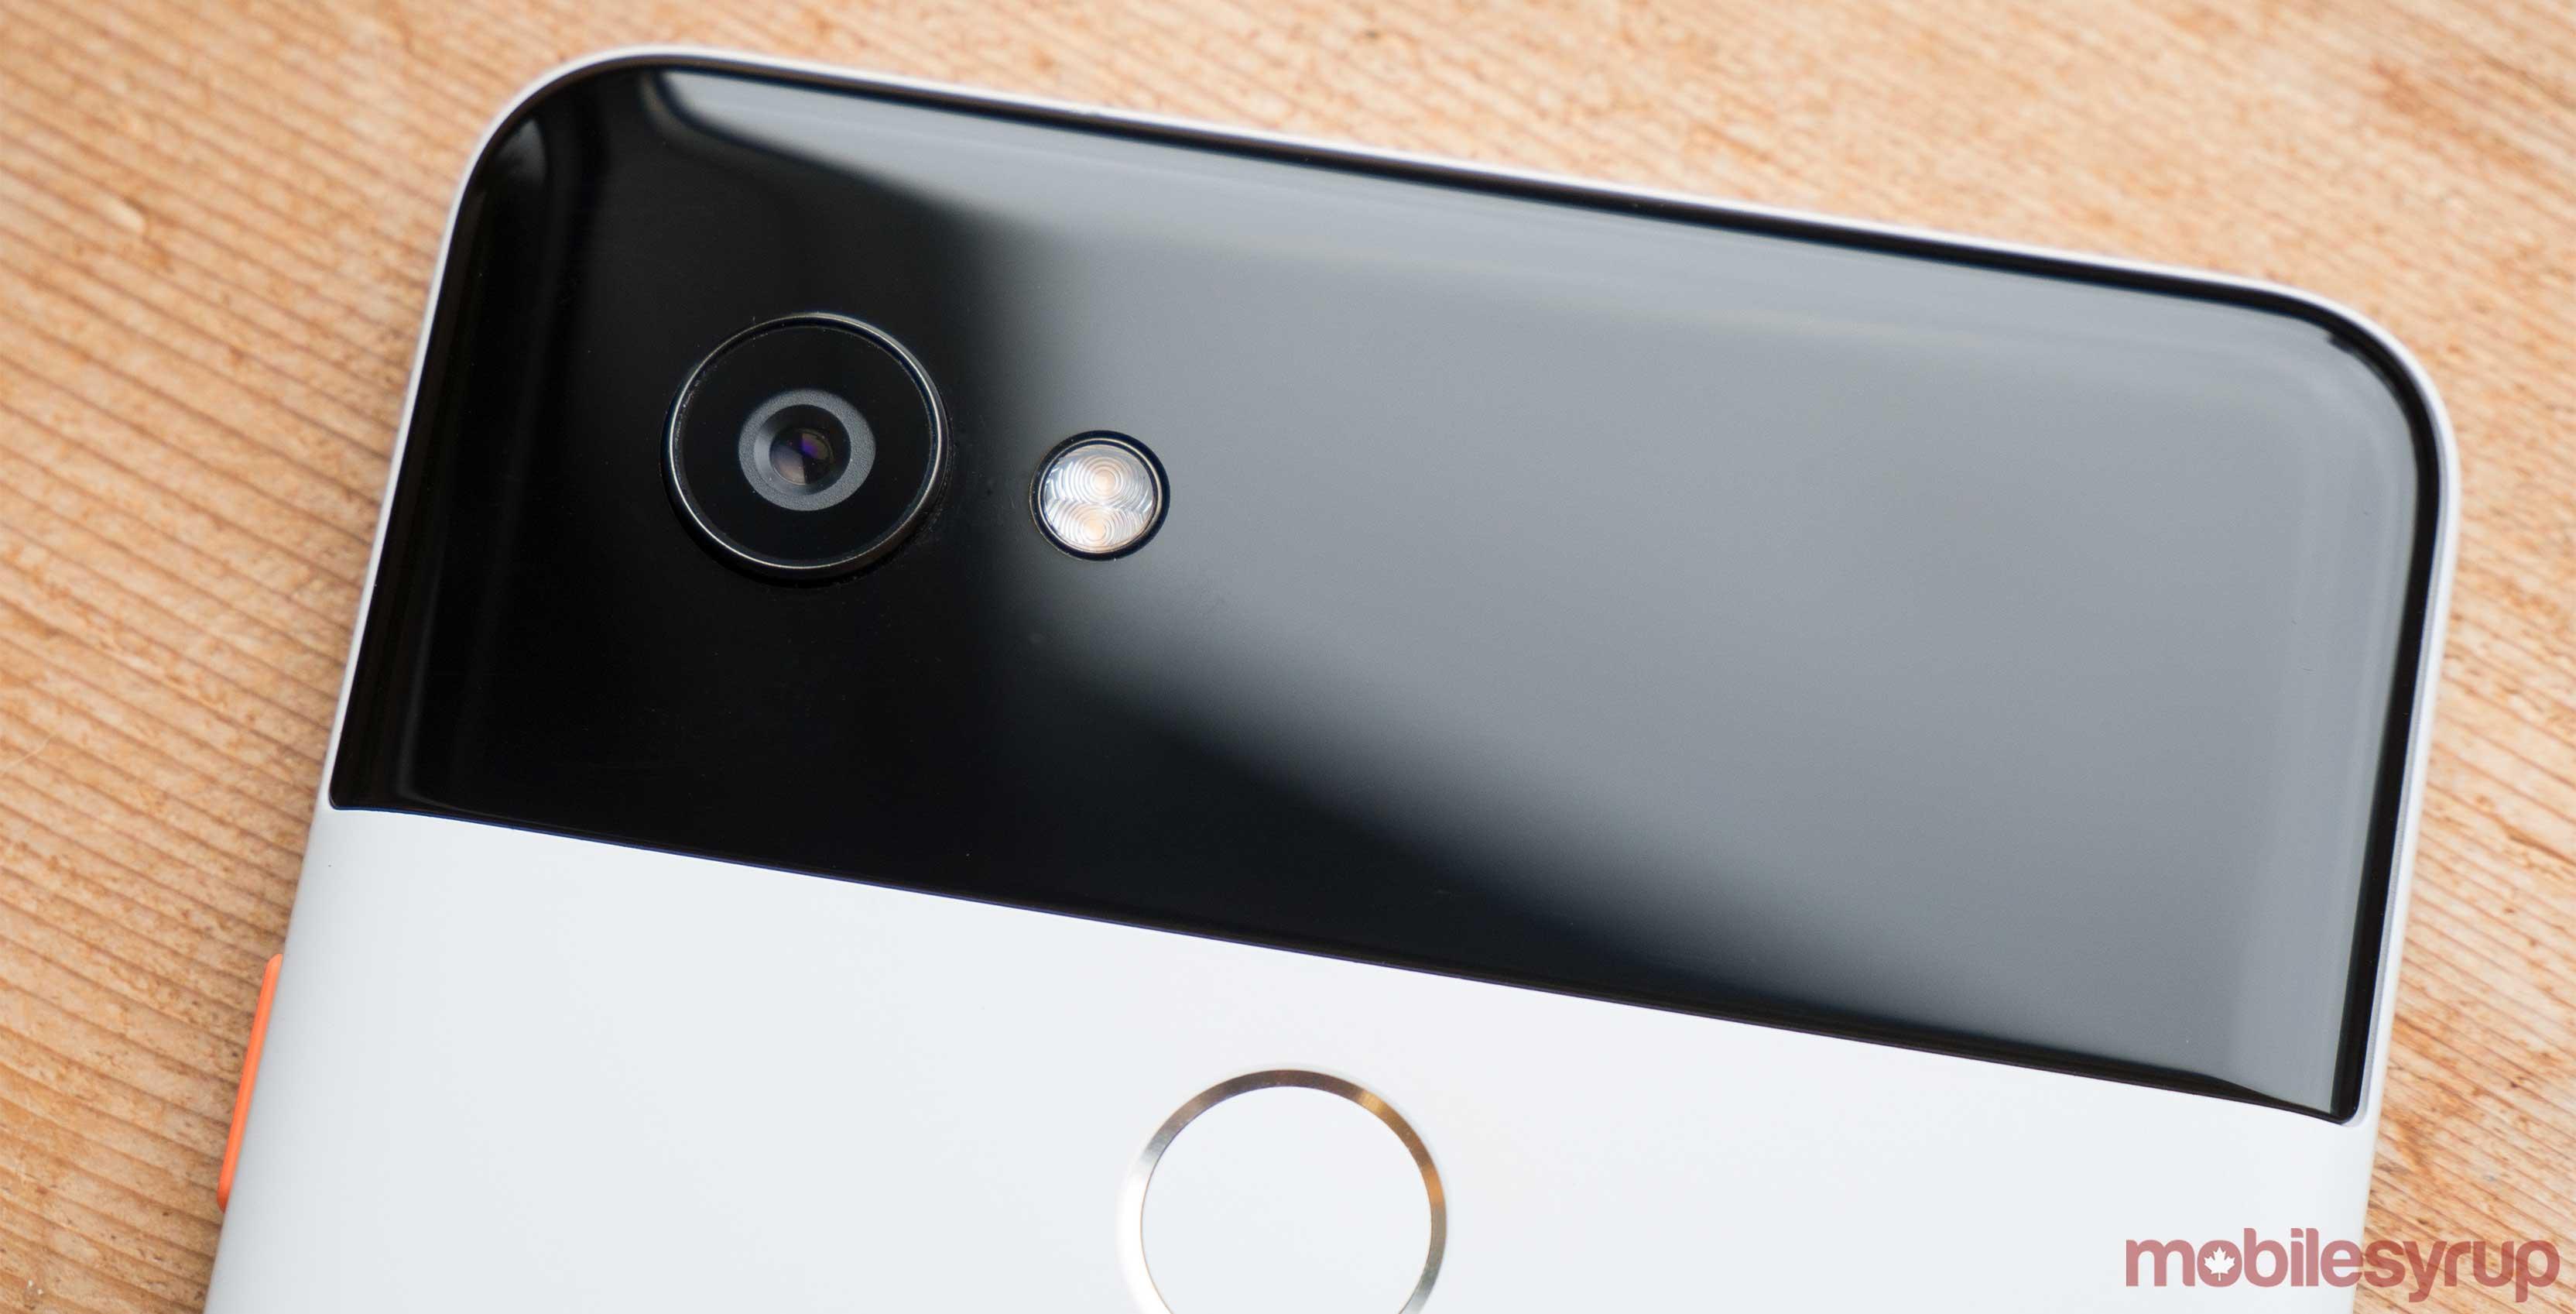 Google's new Pixel 2 XL